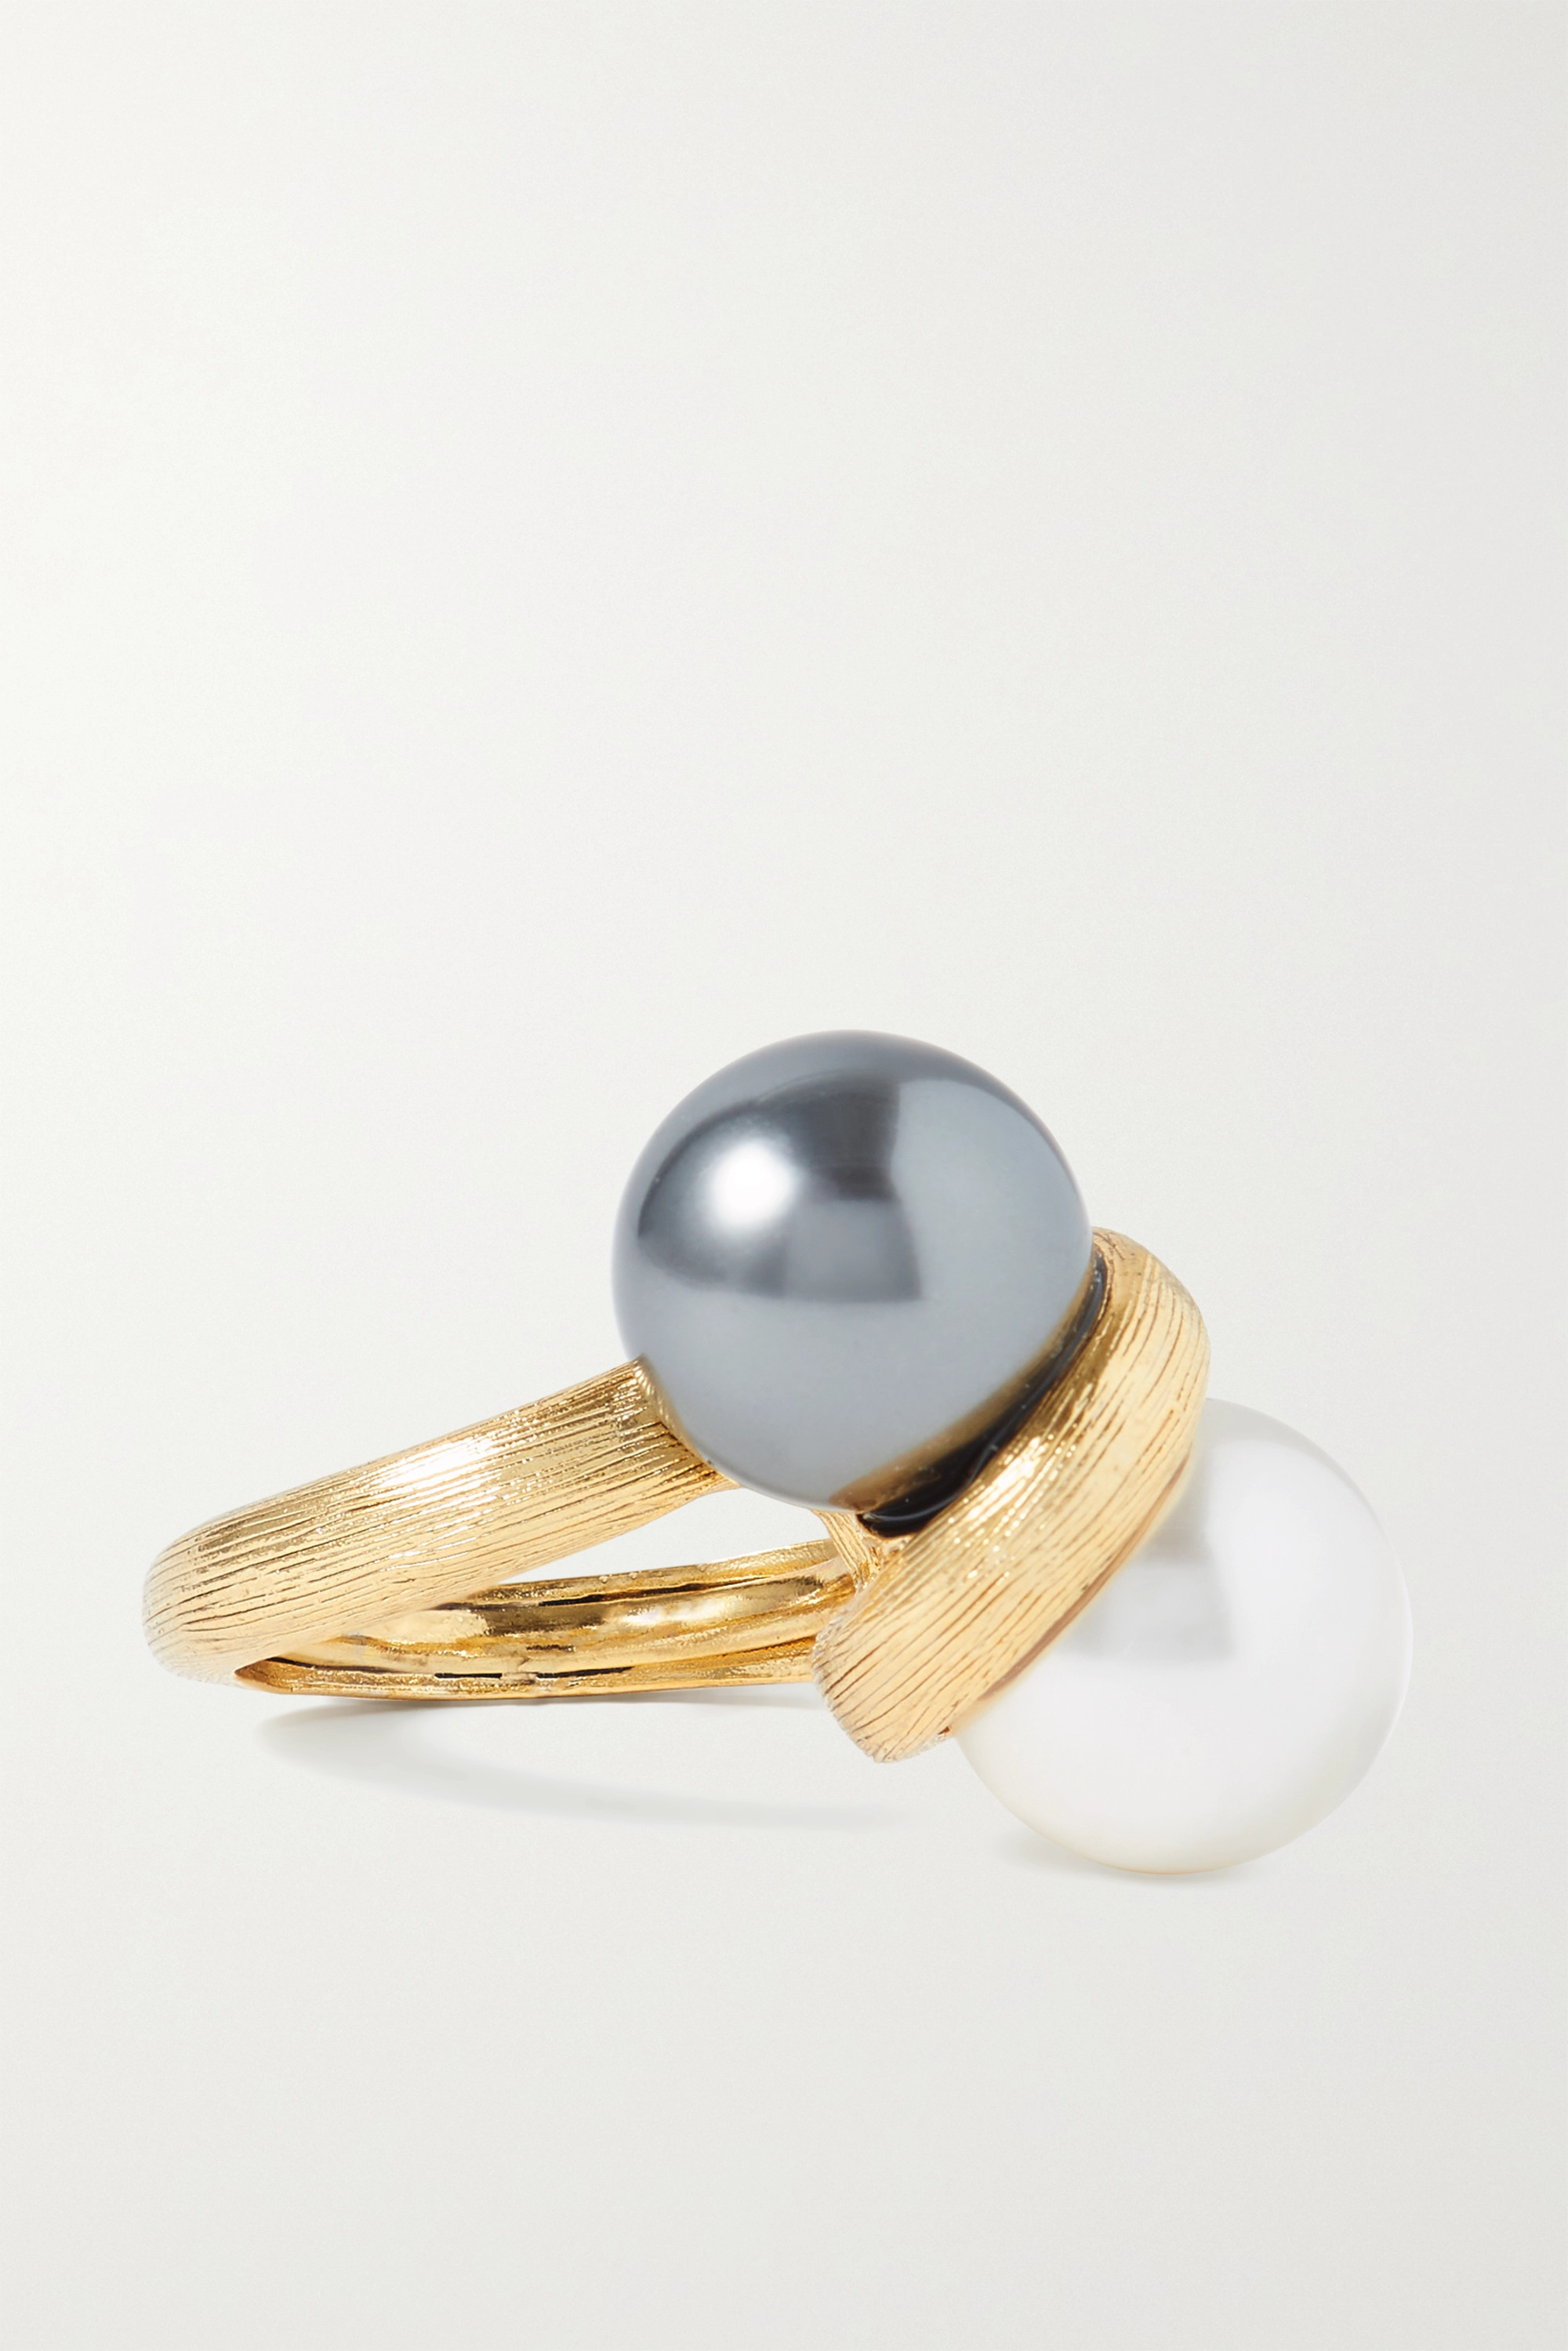 Oscar de la Renta Bague en métal doré et perles synthétiques